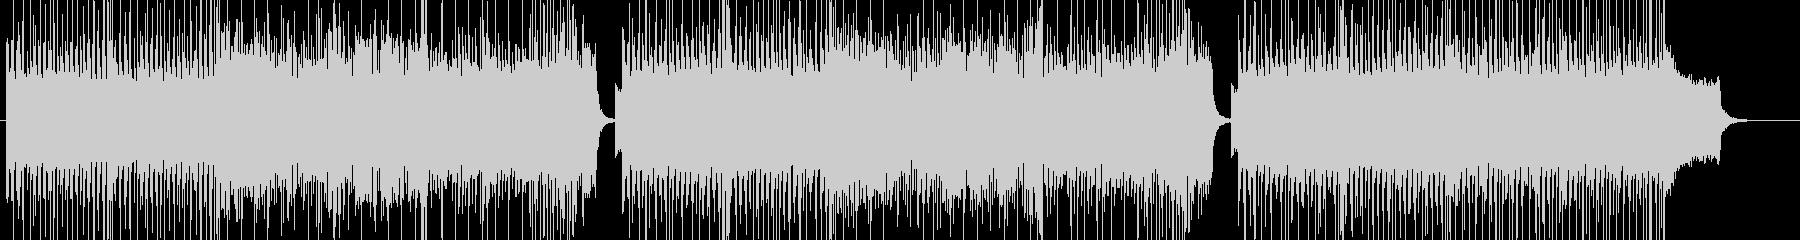 「HR/HM」「POWER」BGM293の未再生の波形